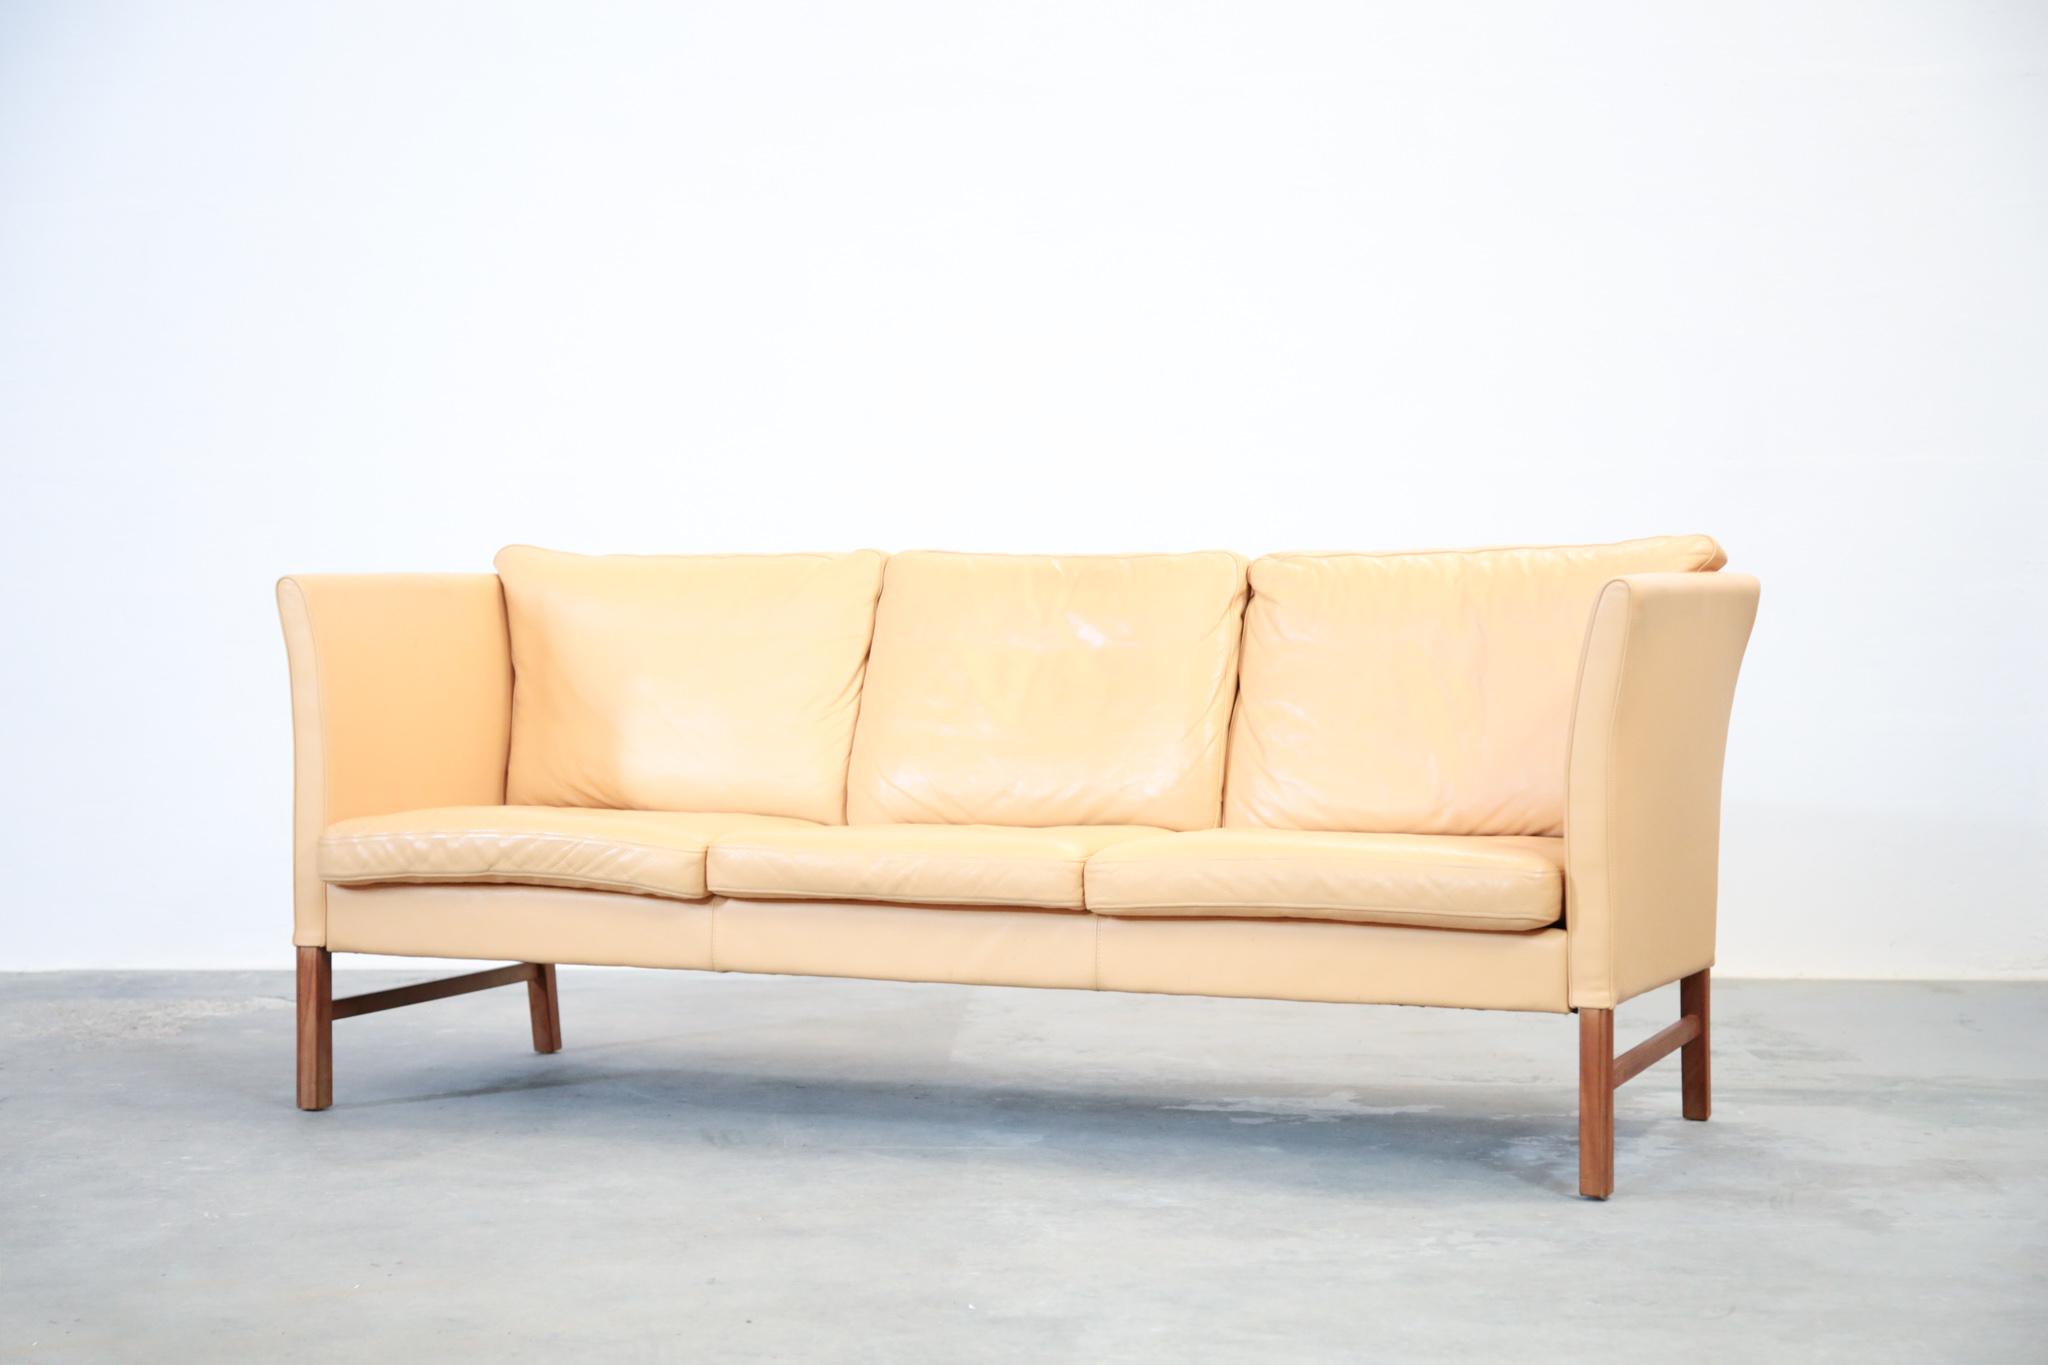 banquette danoise 3 places en cuir beige danke galerie. Black Bedroom Furniture Sets. Home Design Ideas